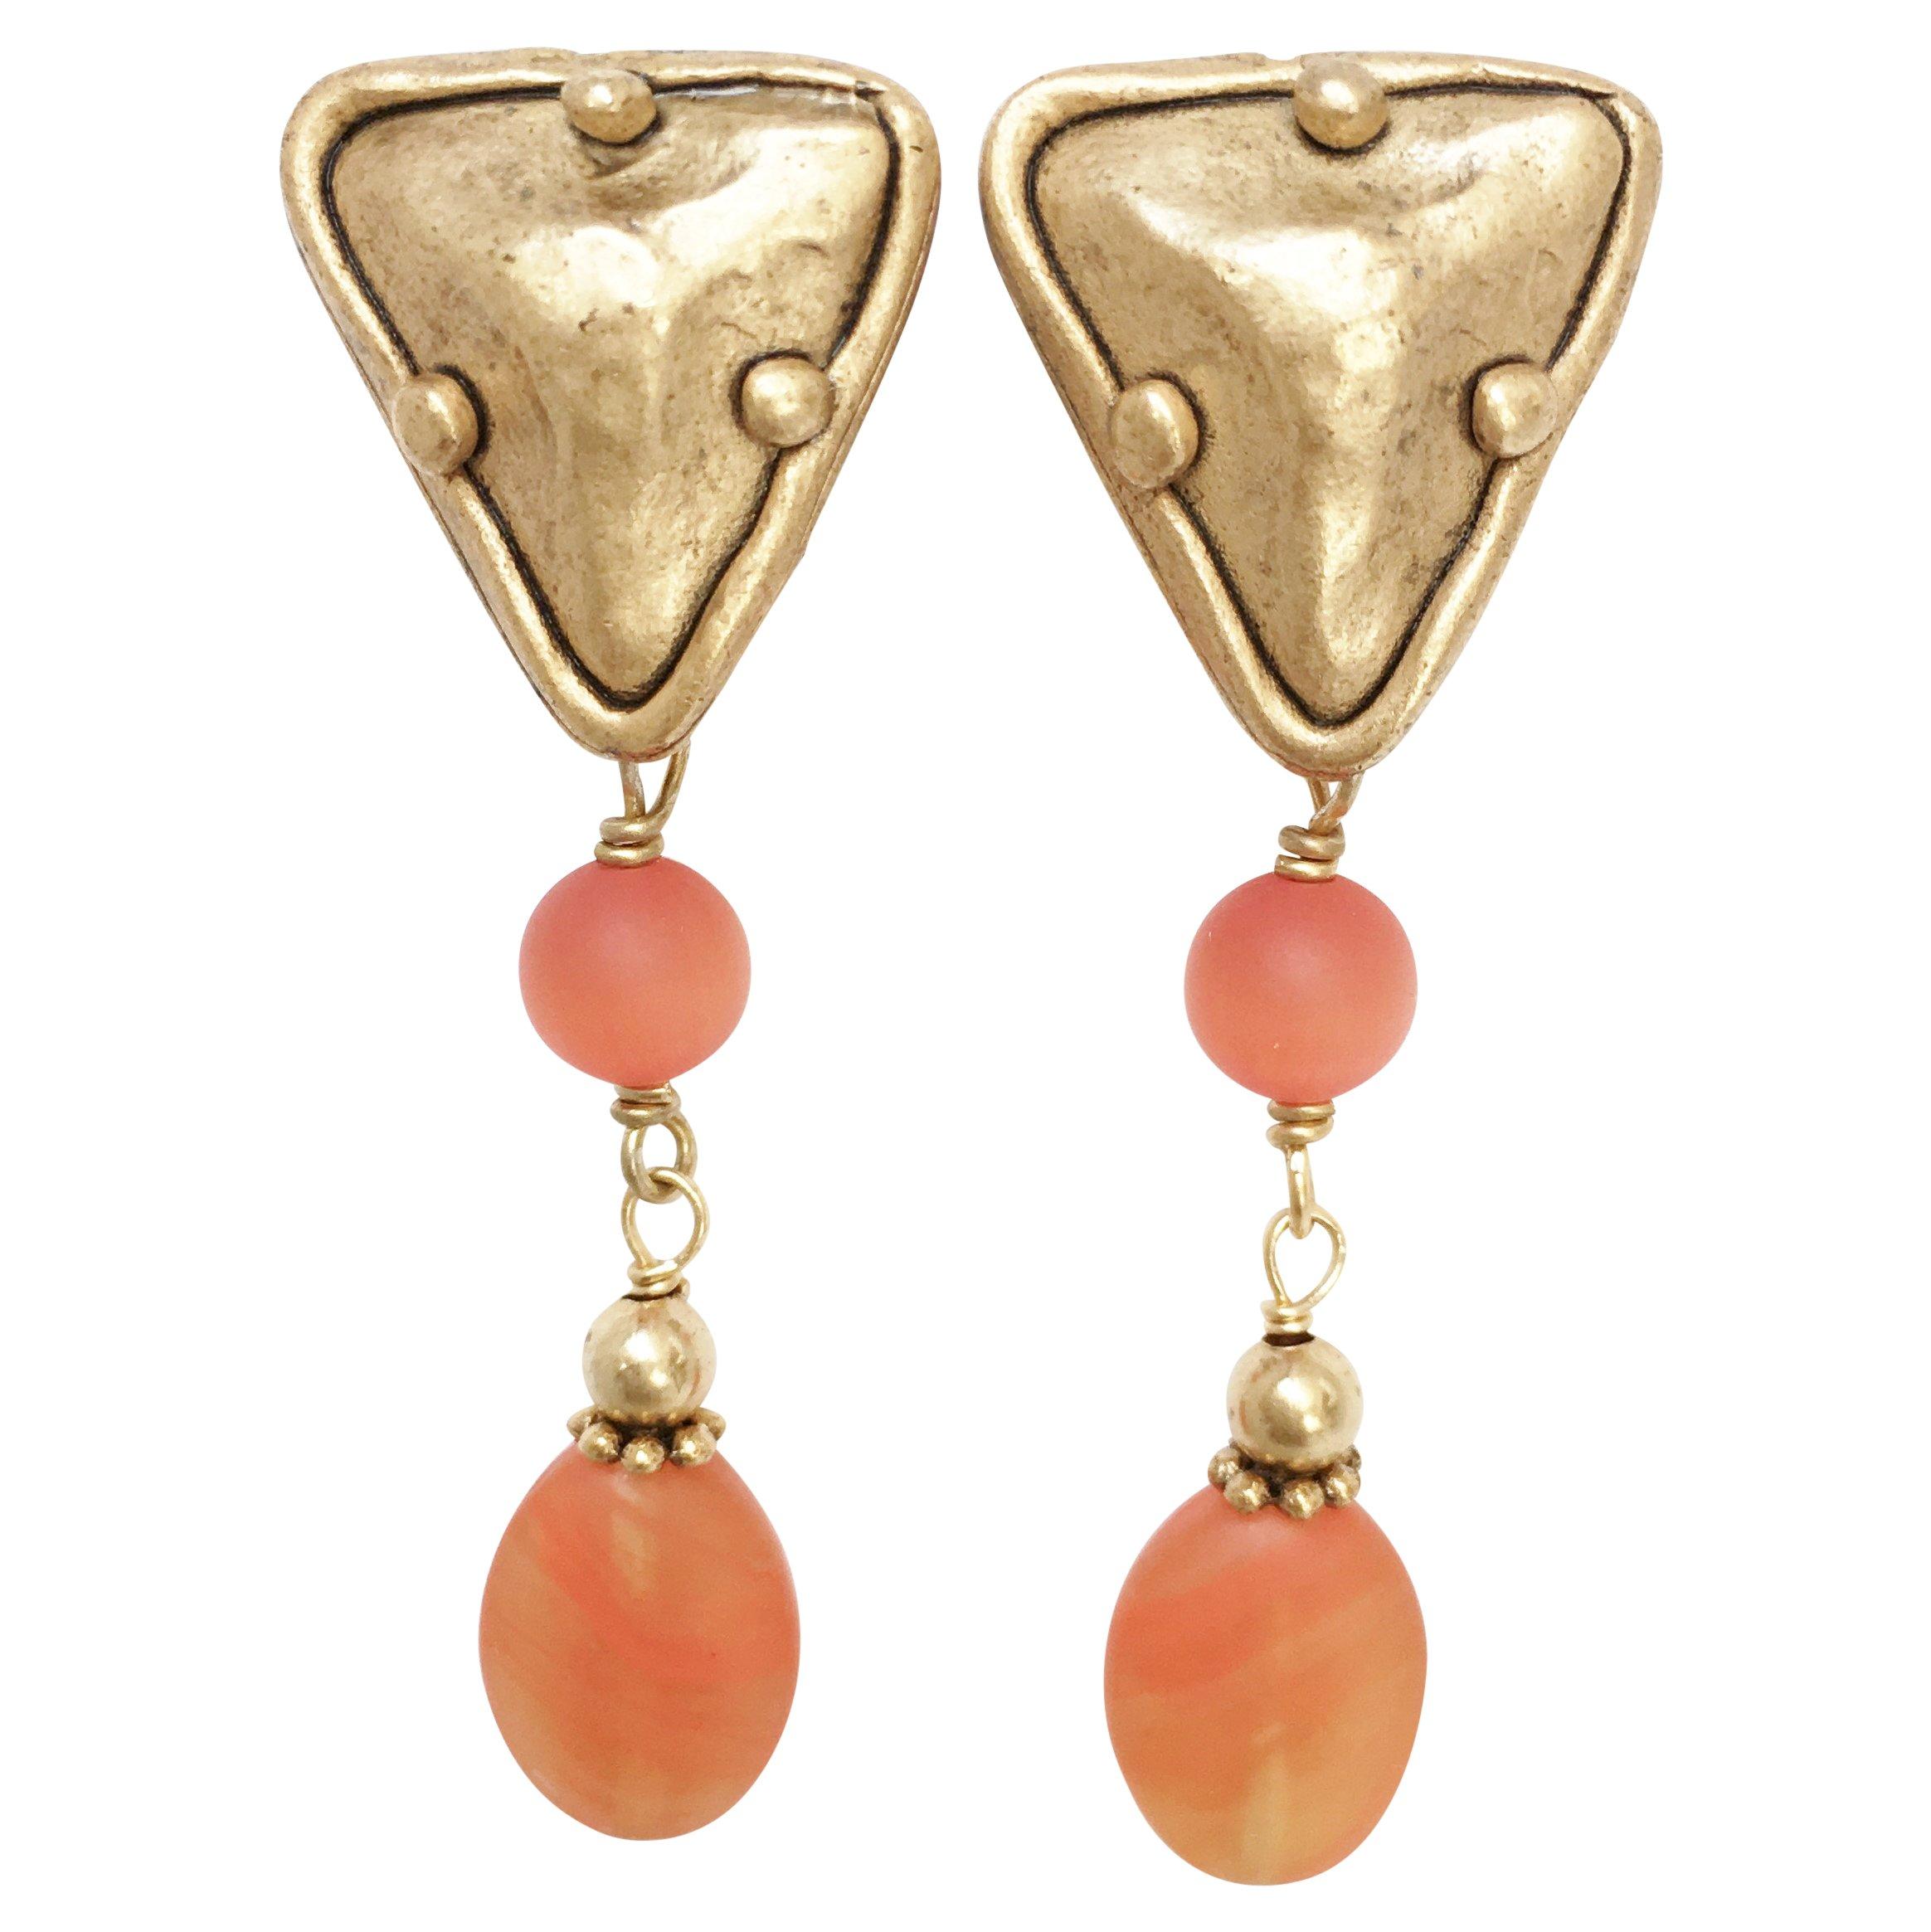 Shaune Bazner Gold-Plated Clip-on Earrings E-C7-20-GC